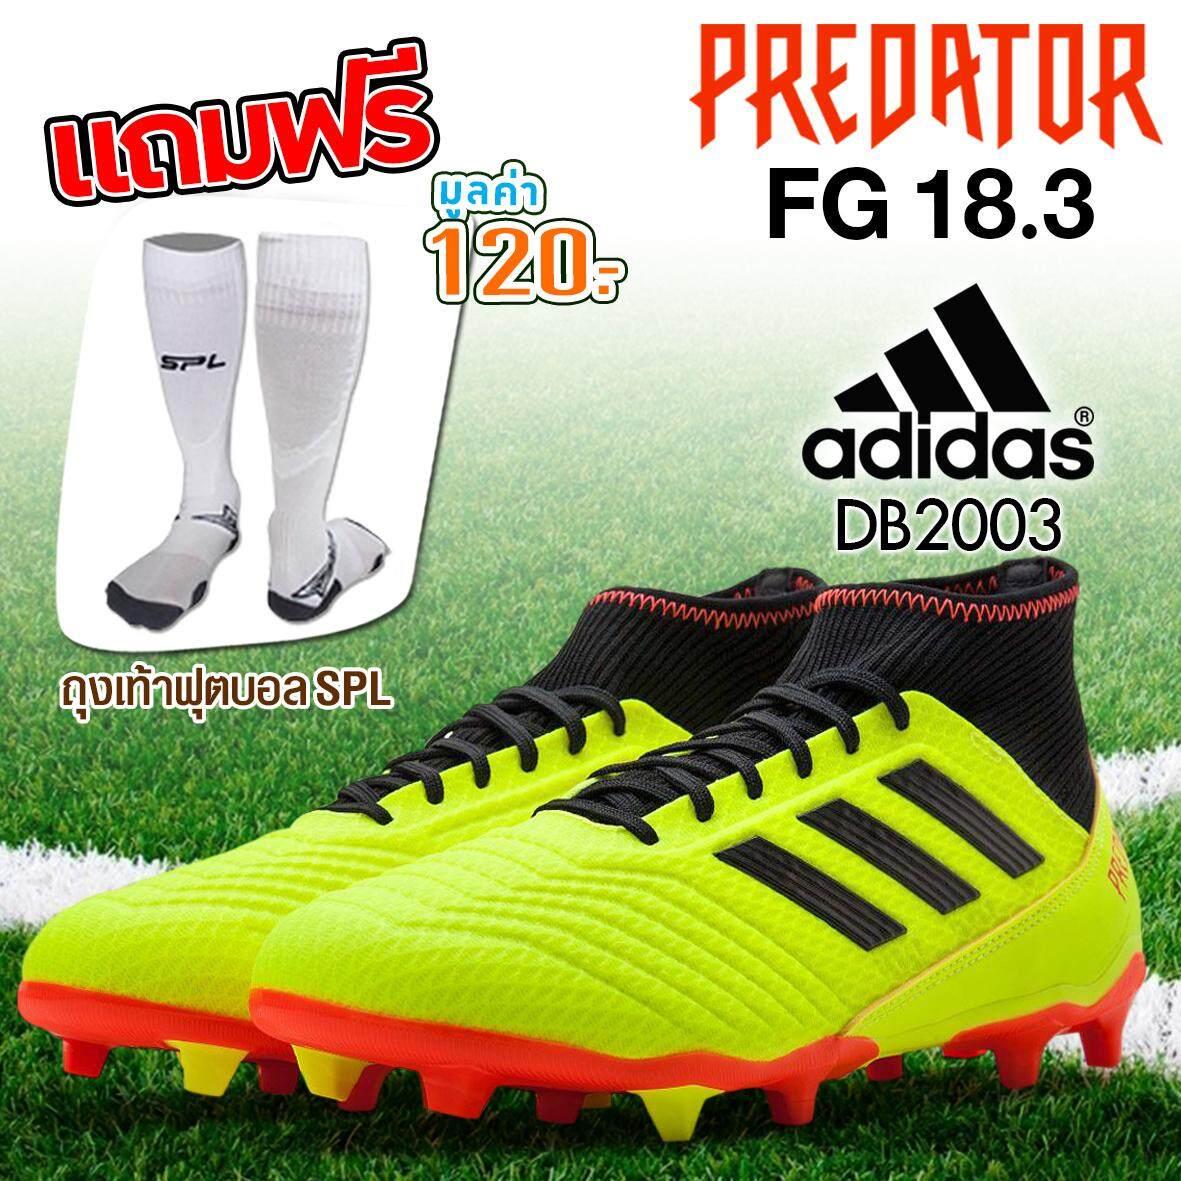 8e98f676e52e Adidas รองเท้า ฟุตบอล อดิดาส Football Shoe PREDATOR PREDATOR 18.3 FIRM  GROUND CLEATS DB2003 YELLOW